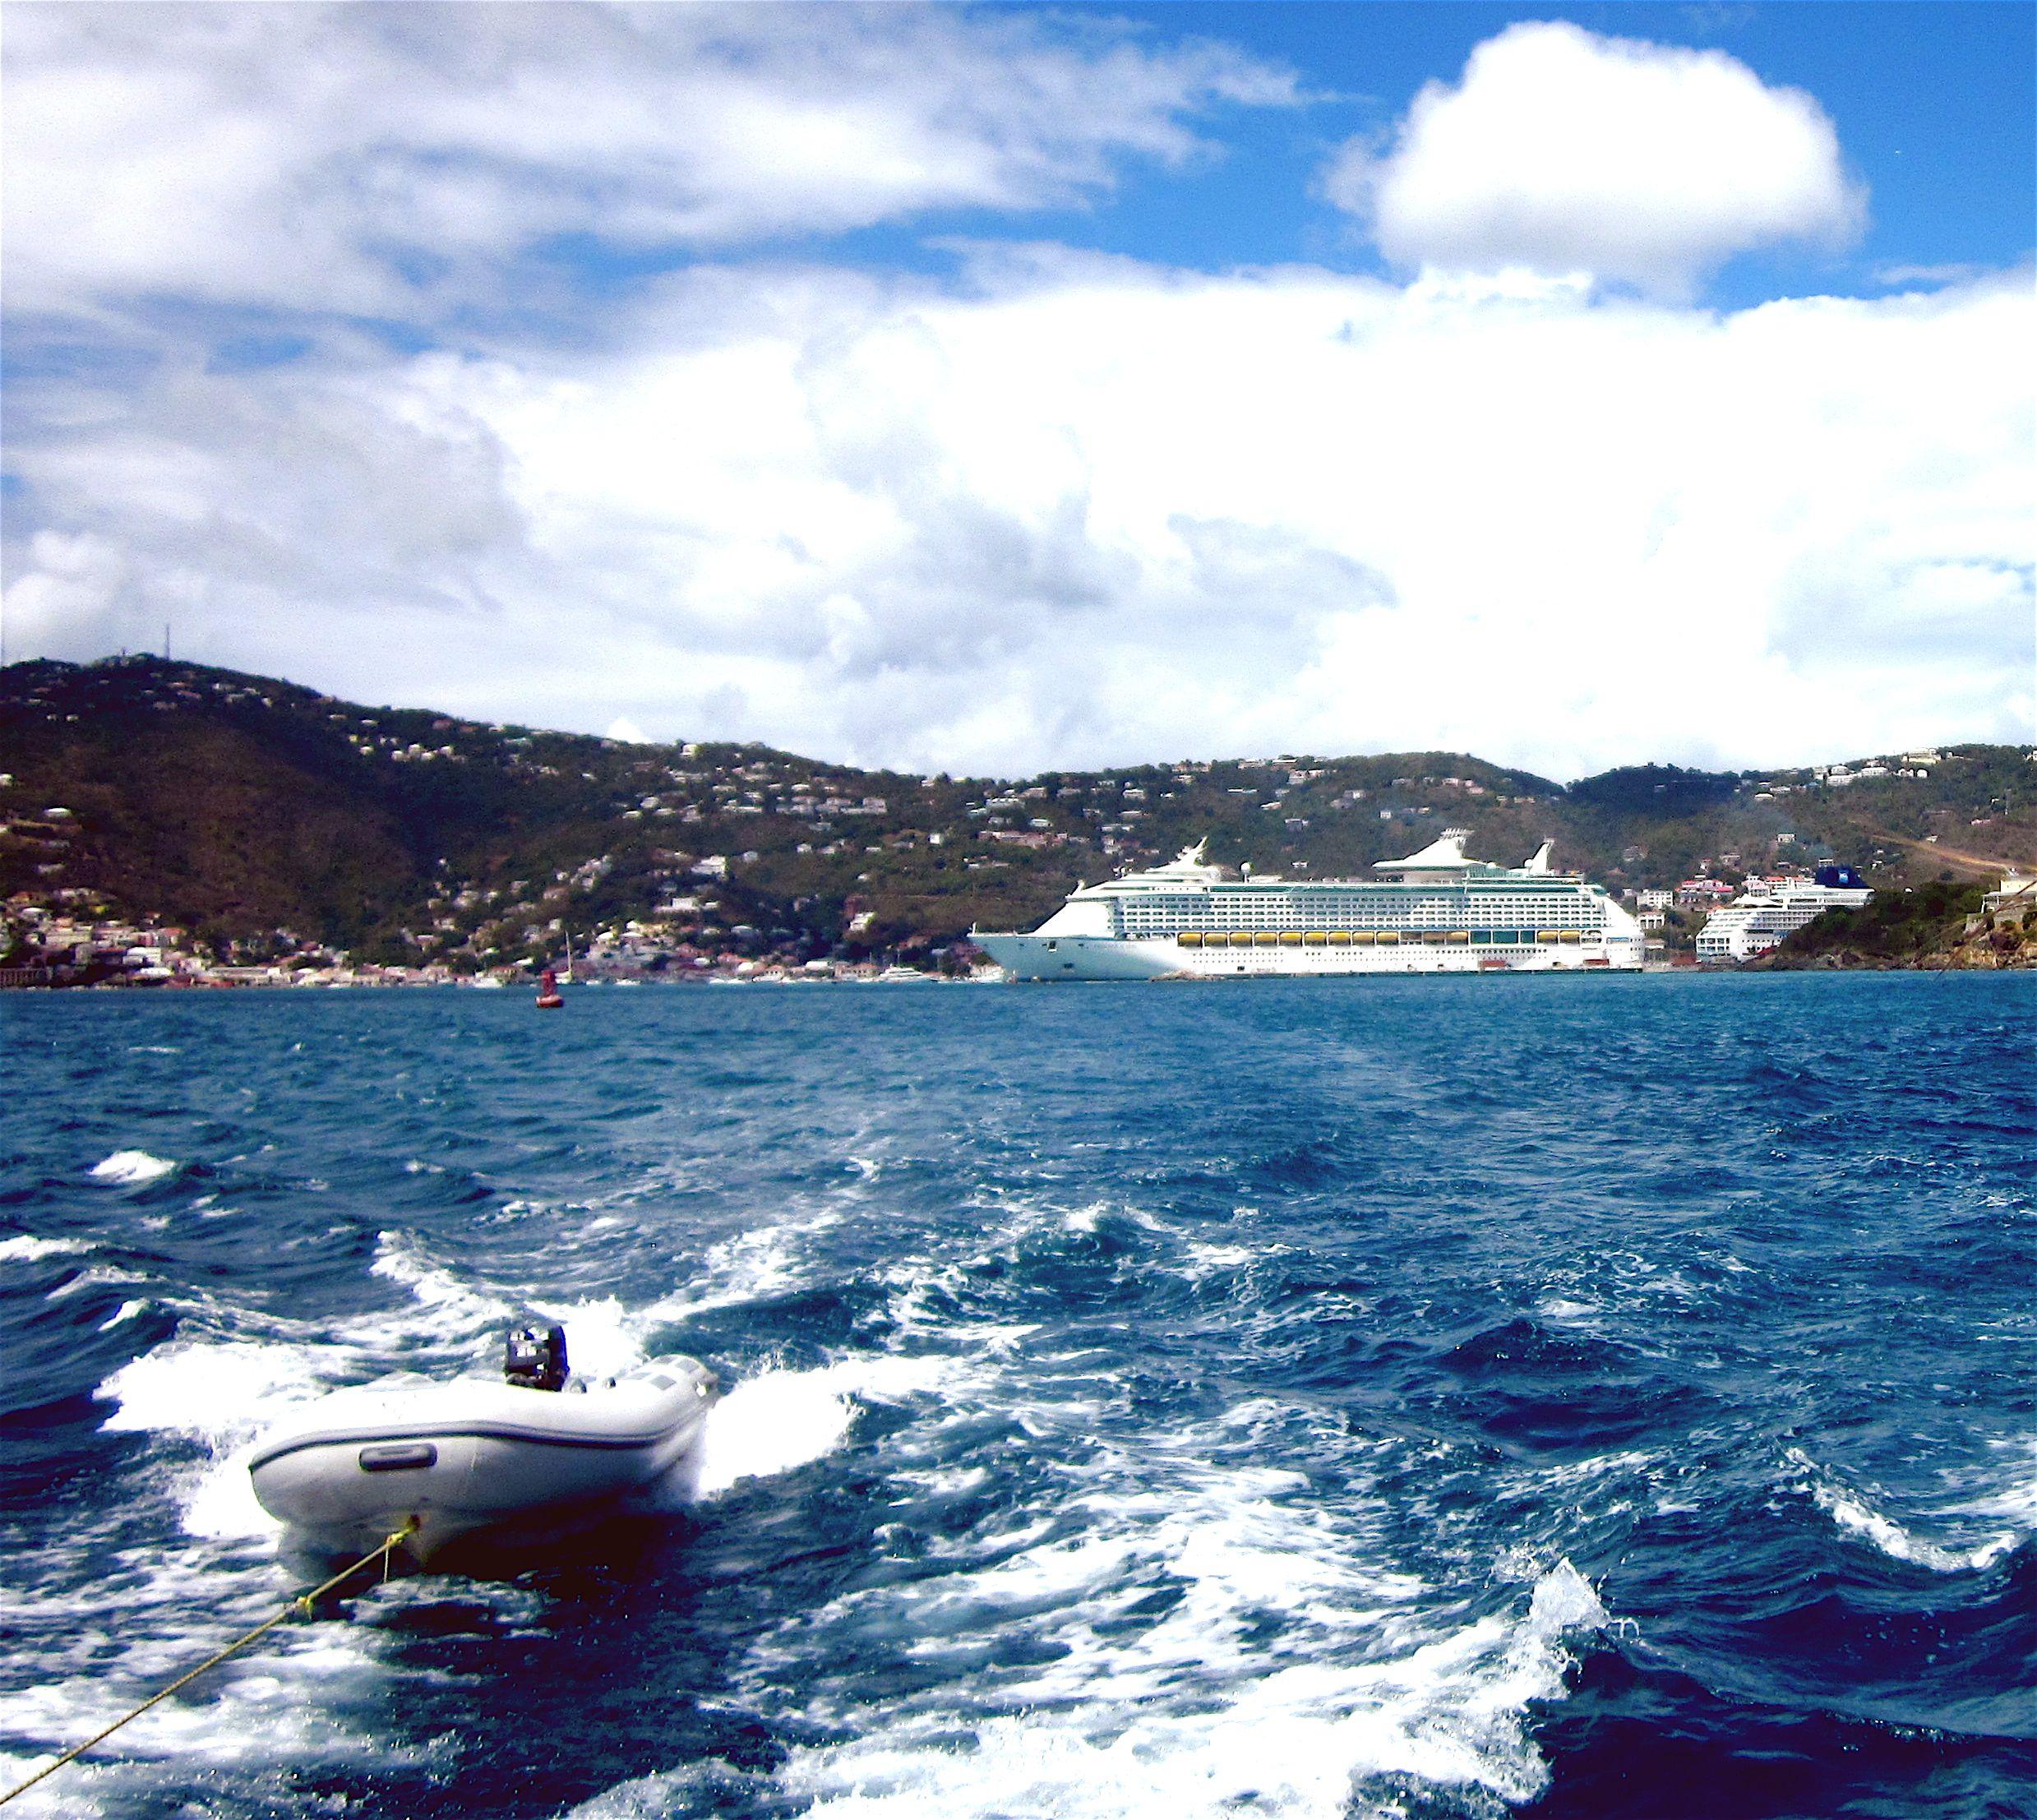 Catamaran Virgin Islands Vacation: Catamaran Off The Coast Of St. Thomas, U.S. Virgin Islands